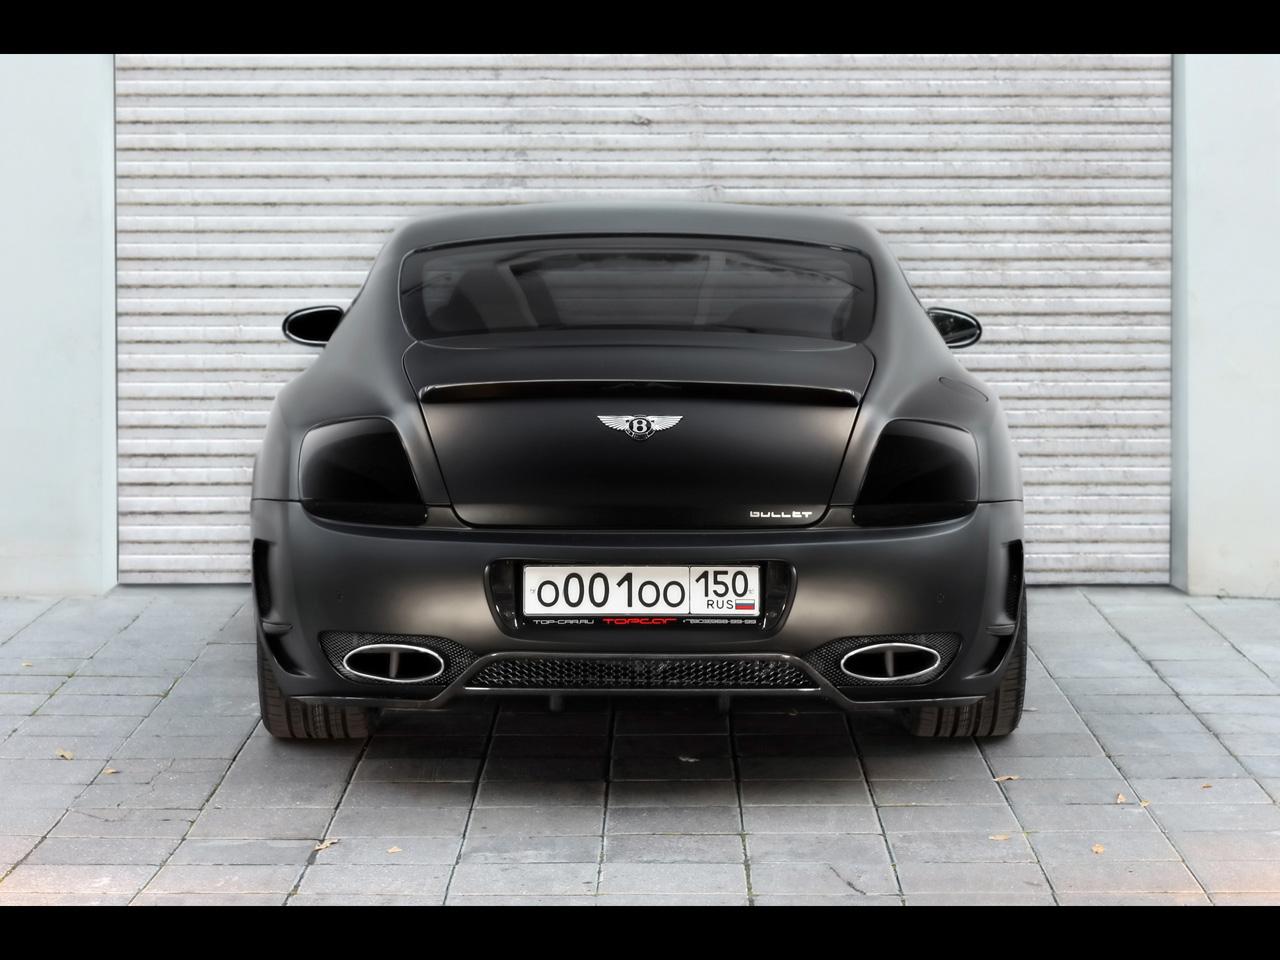 http://3.bp.blogspot.com/-lROFNlUzJh0/Tt8jpxfl6sI/AAAAAAAABE0/_95W2uf6FEE/s1600/Bentley-Continental-GT-Bullet-4.jpg